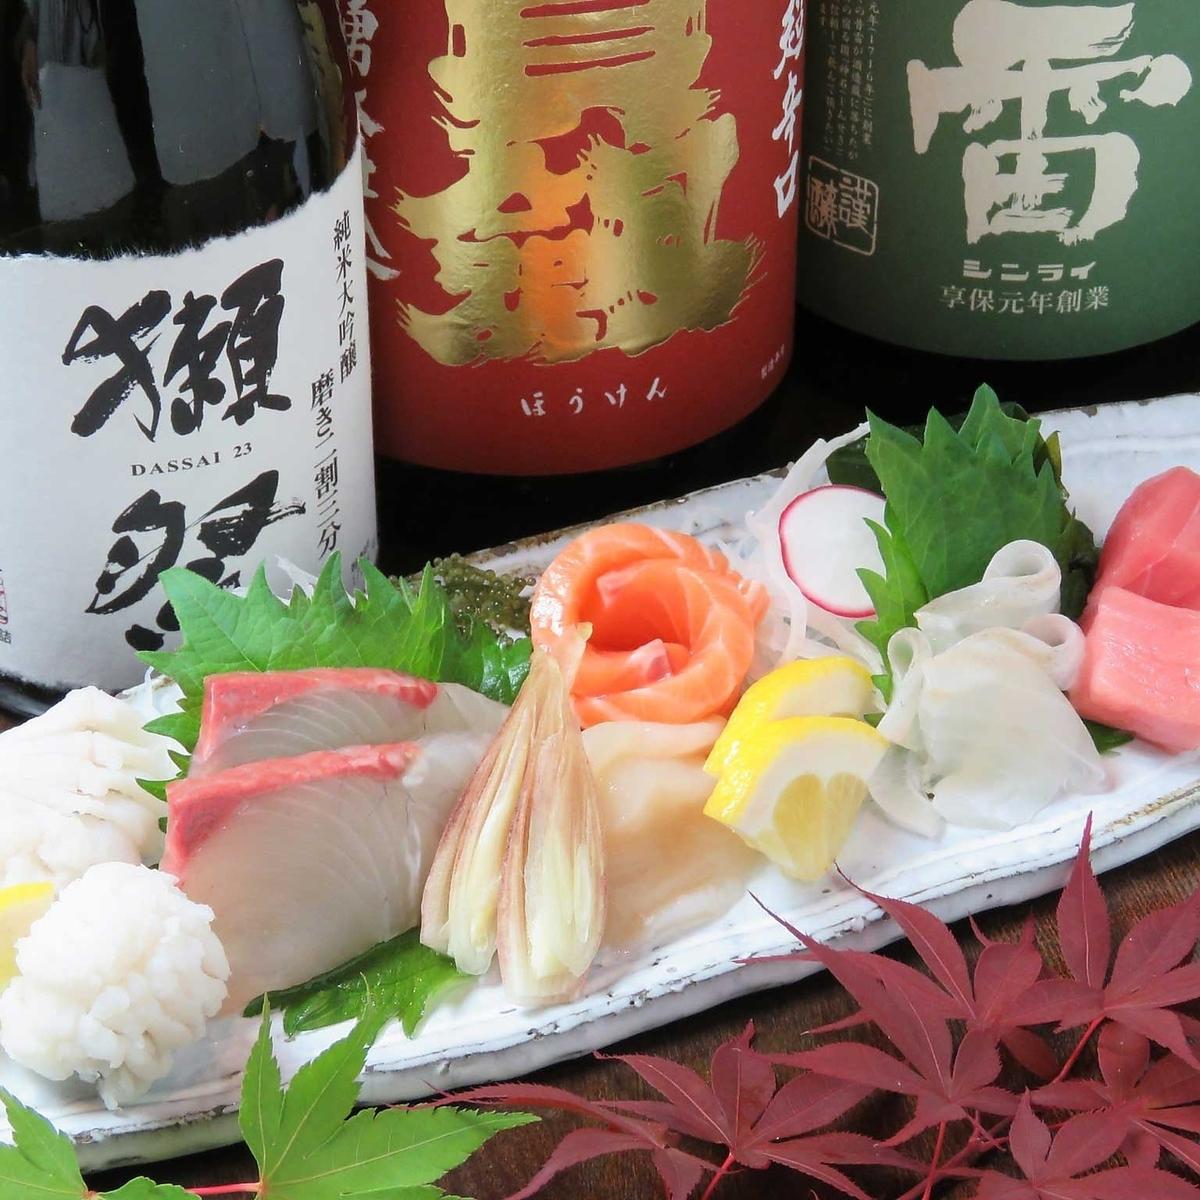 Cook using Setouchi production area